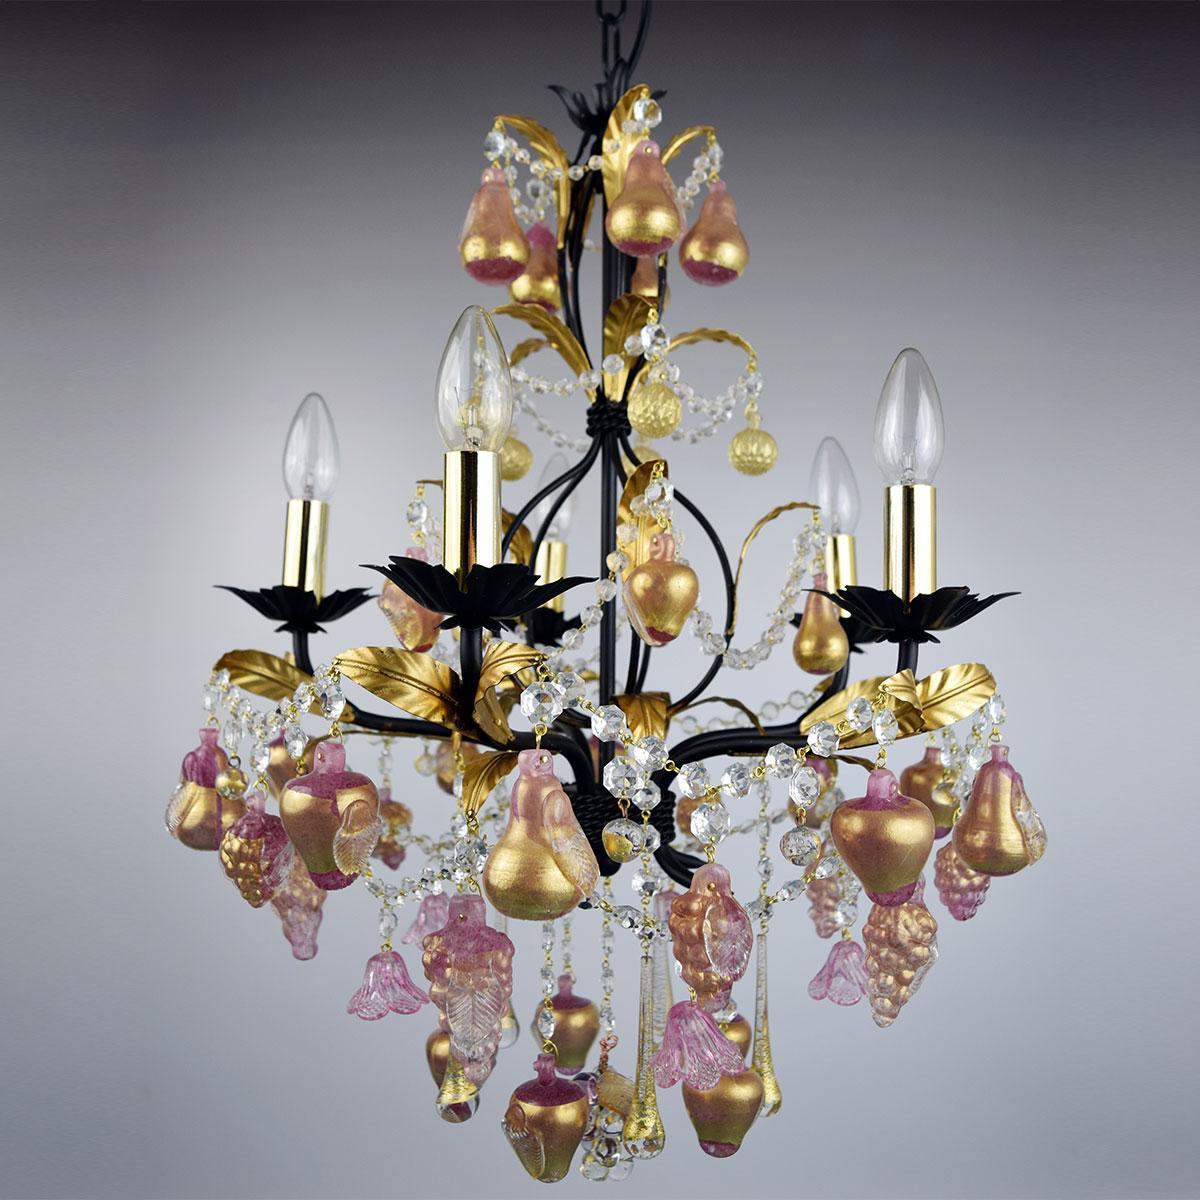 """Grappoli"" Murano glas Kronleuchter - 5 flammig - gold"